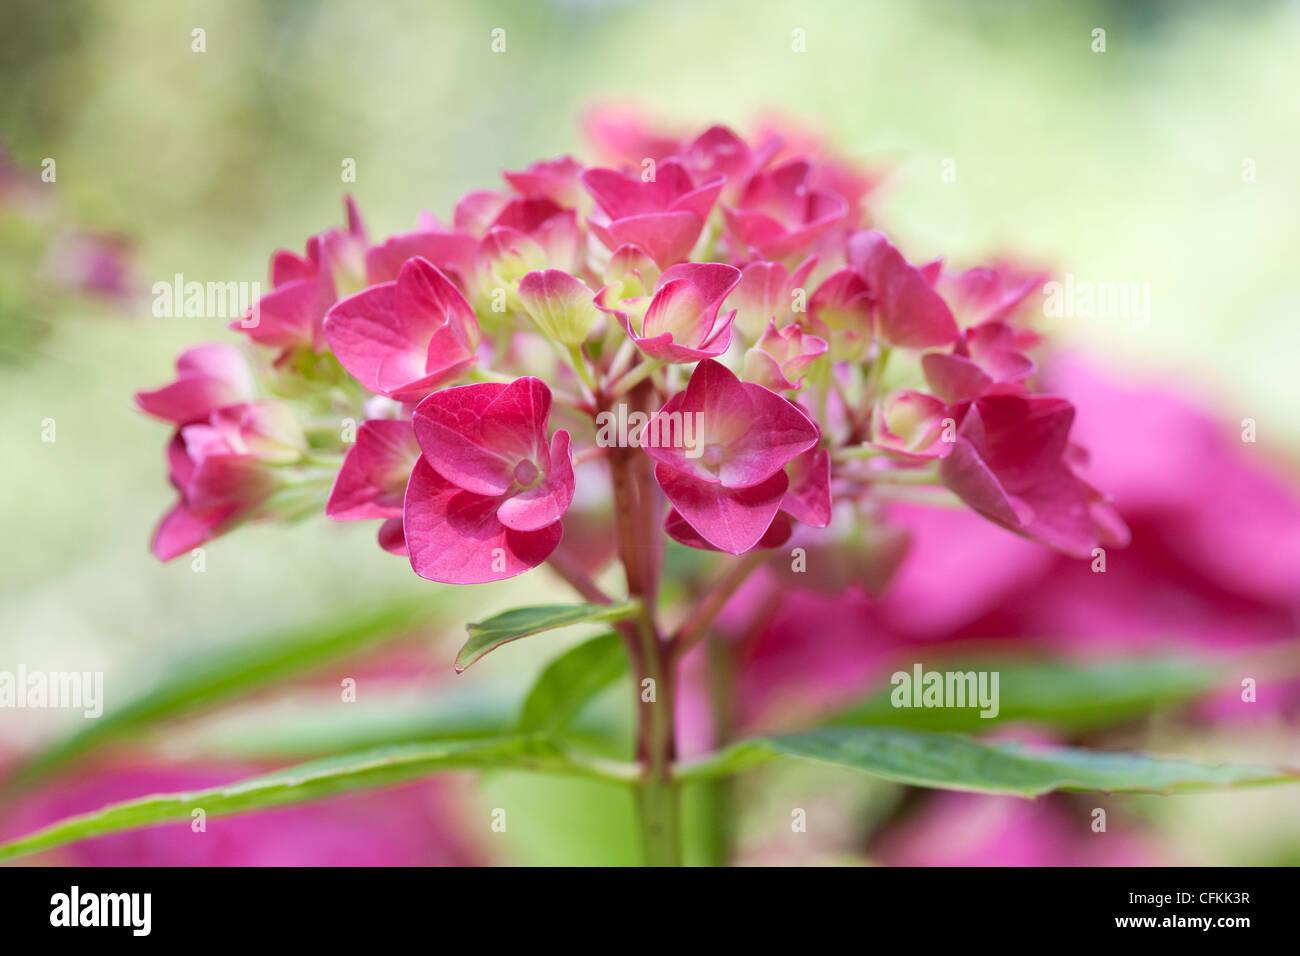 Hydrangea macrophylla 'Vorster Fruhro'. - Stock Image